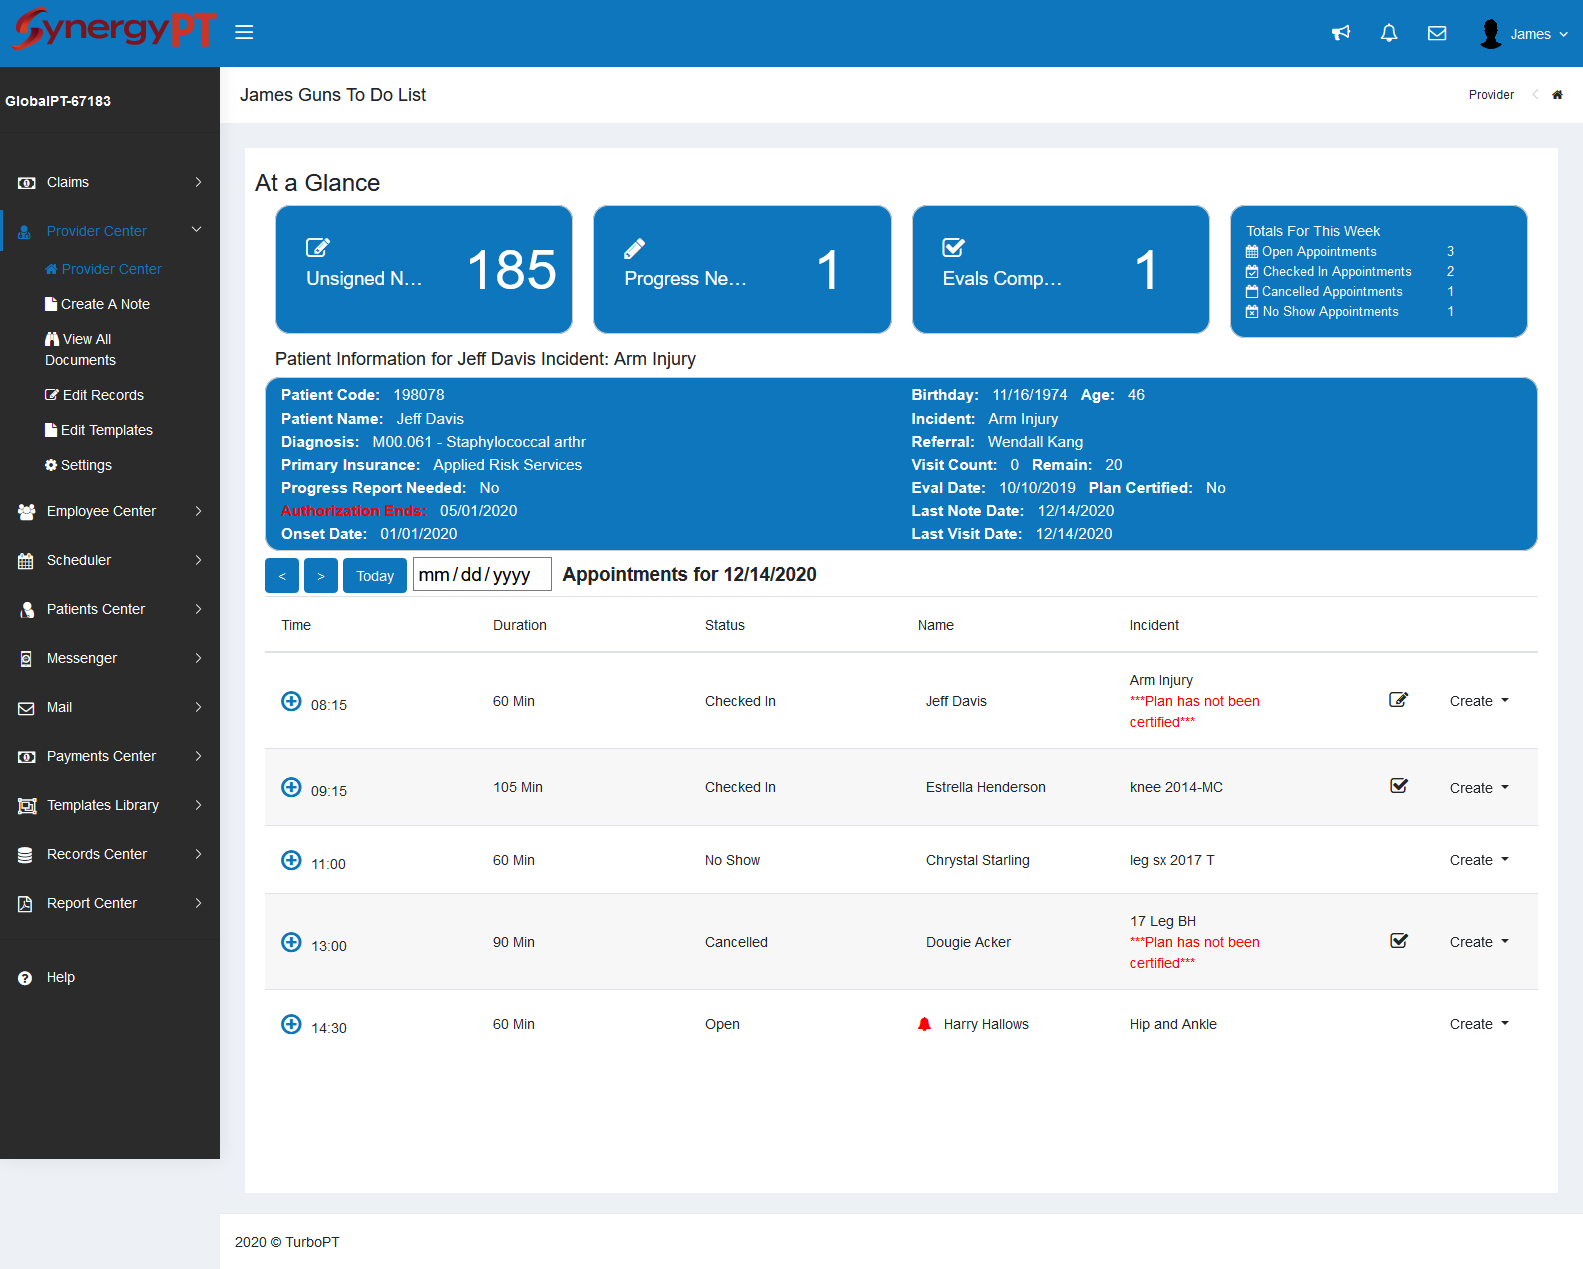 SynergyPT Provider screen